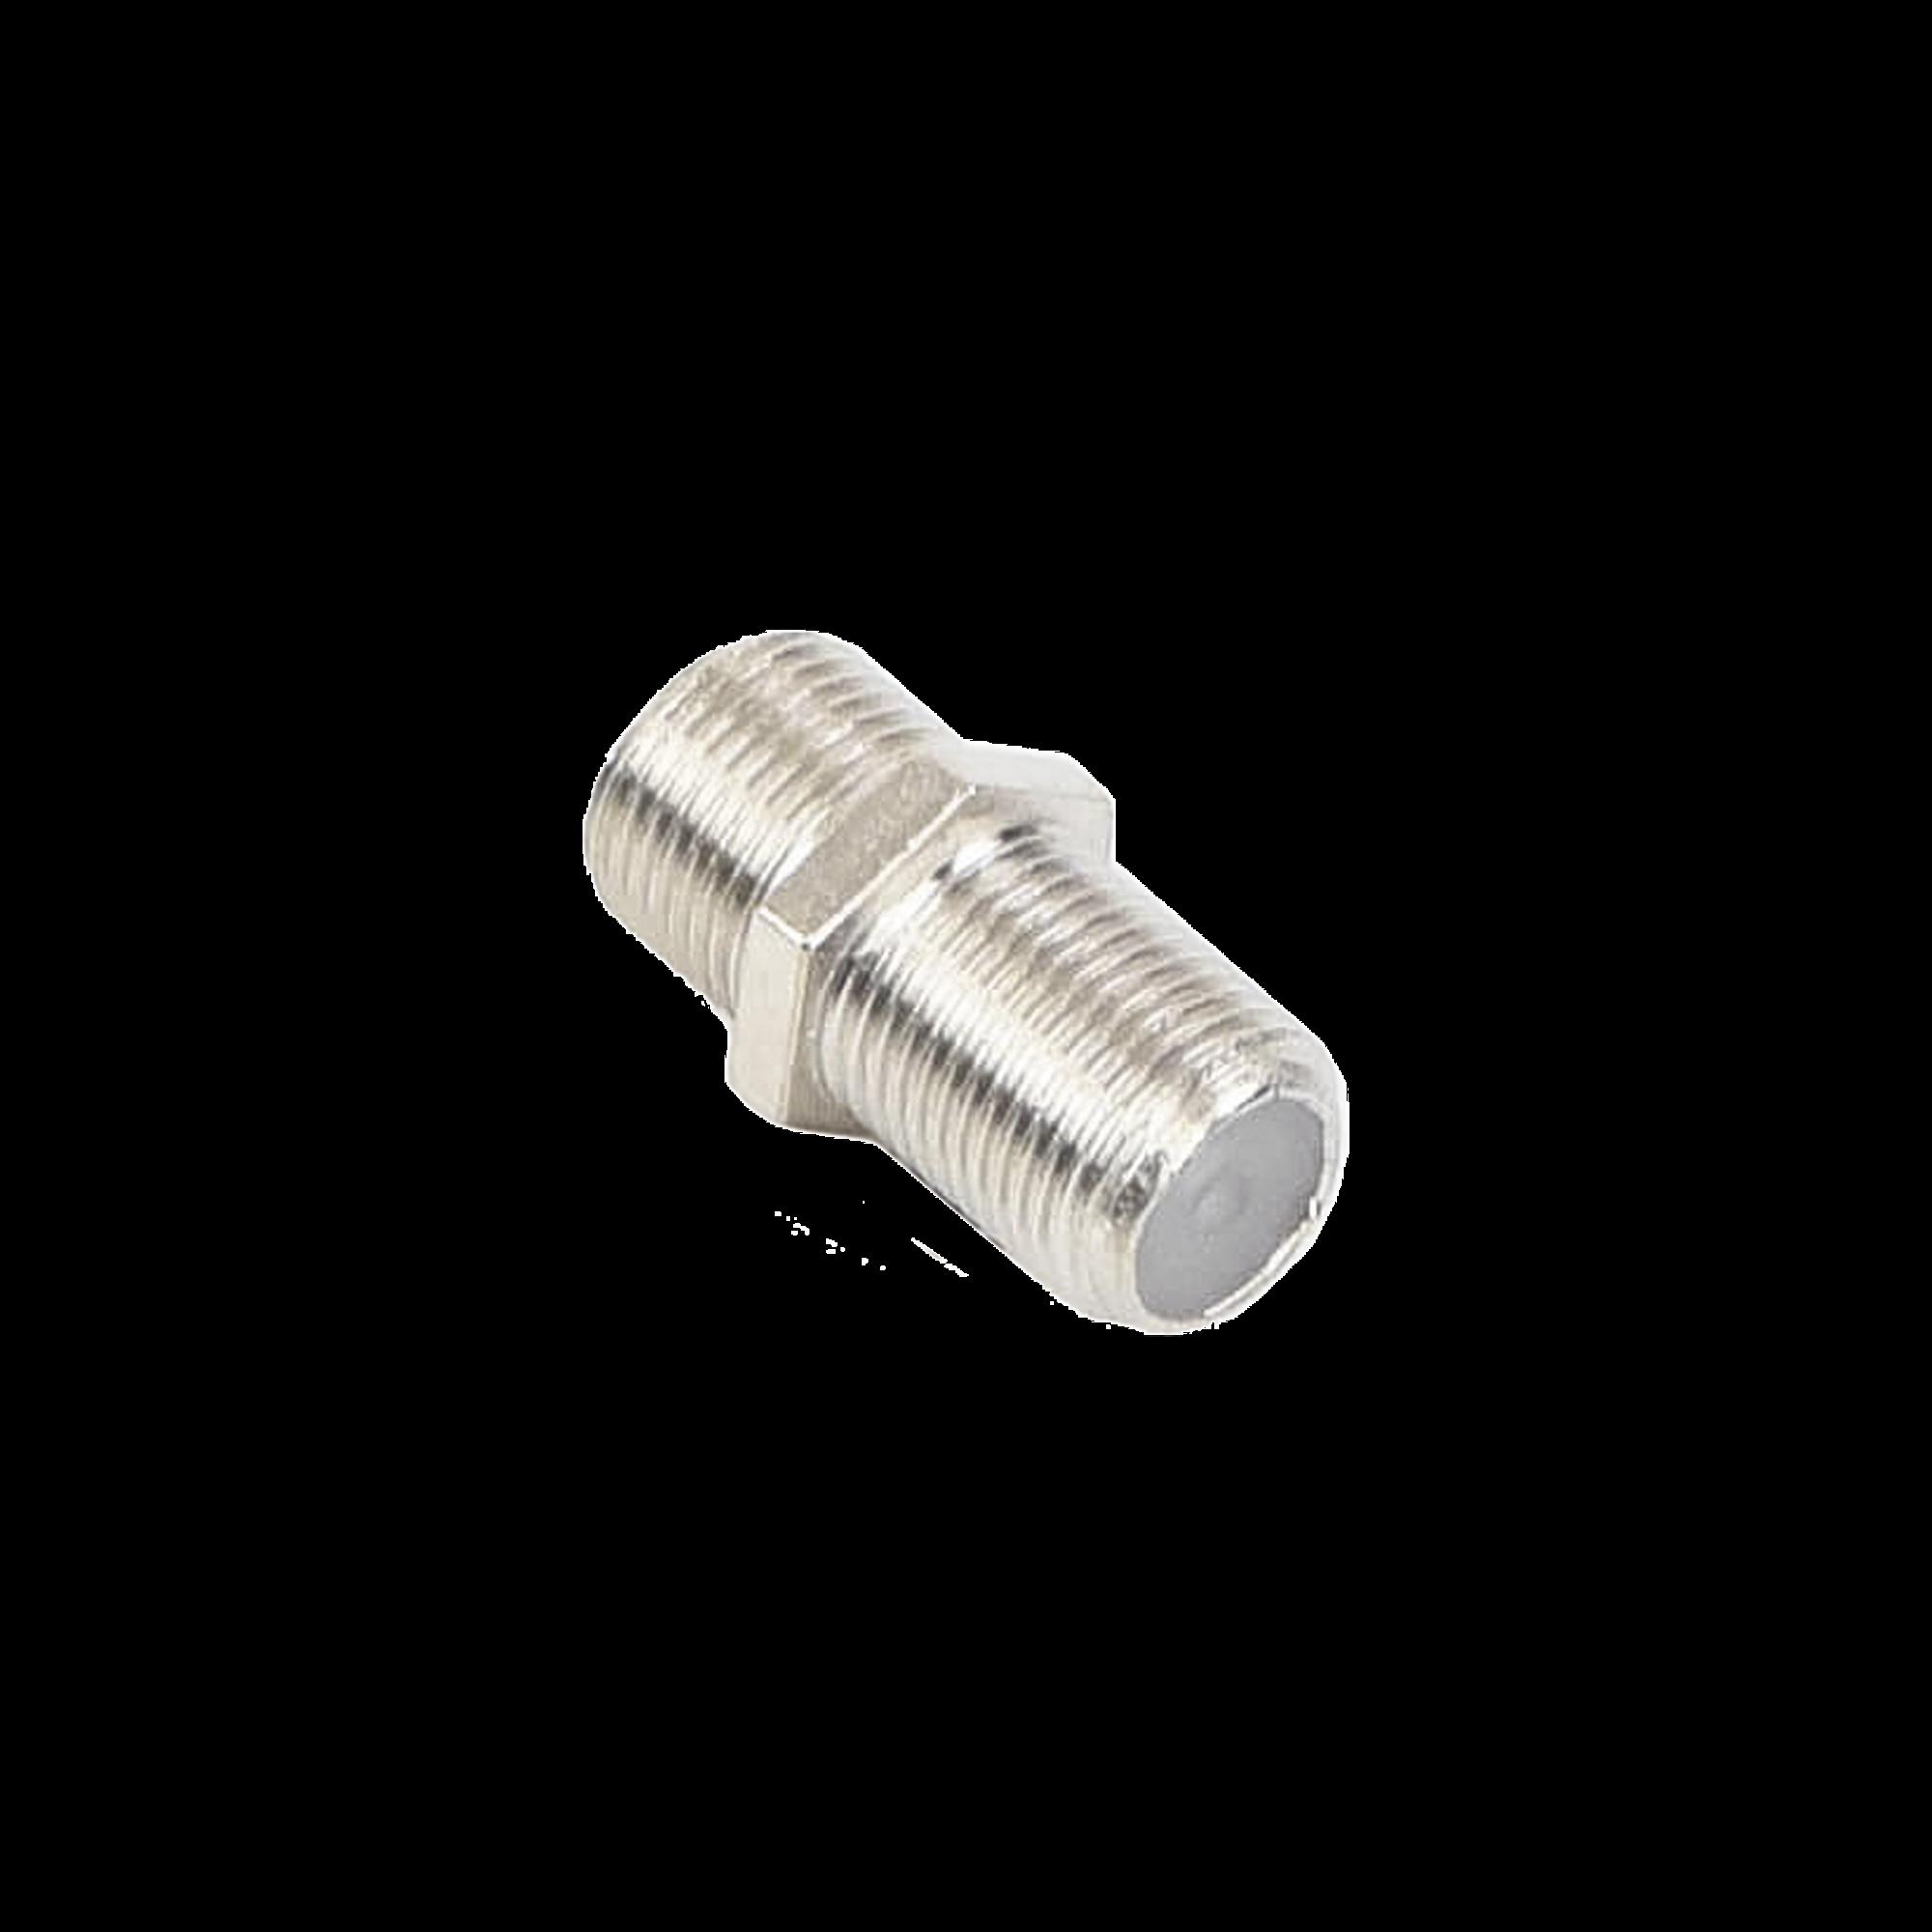 Adaptador Barril para 75 Ohm, de Conector F Hembra a F Hembra, Niquel / Estaño / Polietileno.